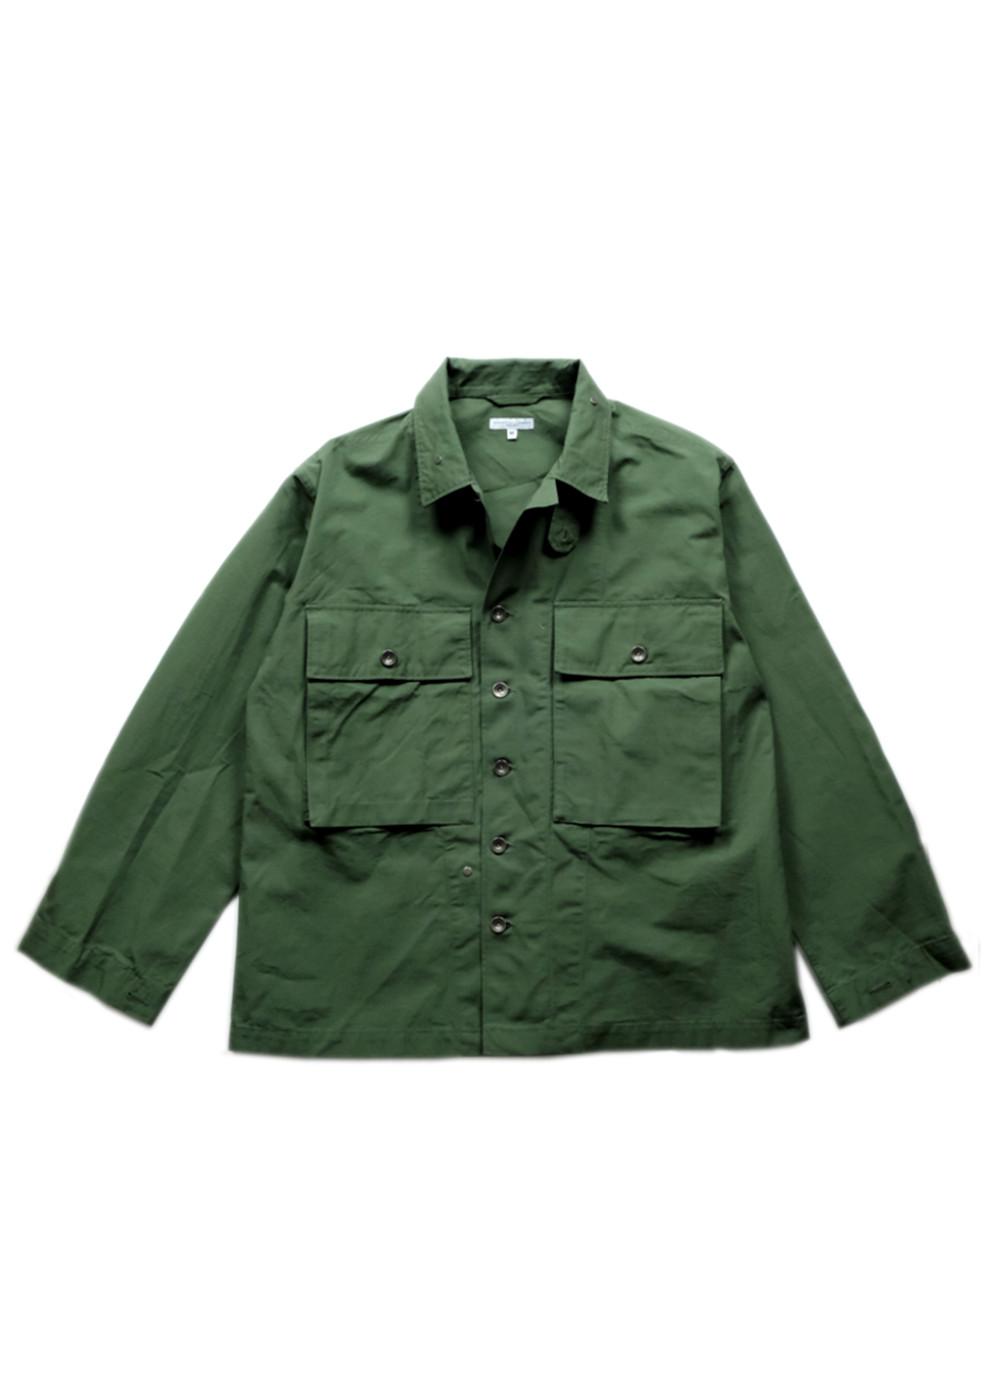 Engineered-Garments-M43-2-Shirt-Jacket-Olive-Cotton-Ripstop-01